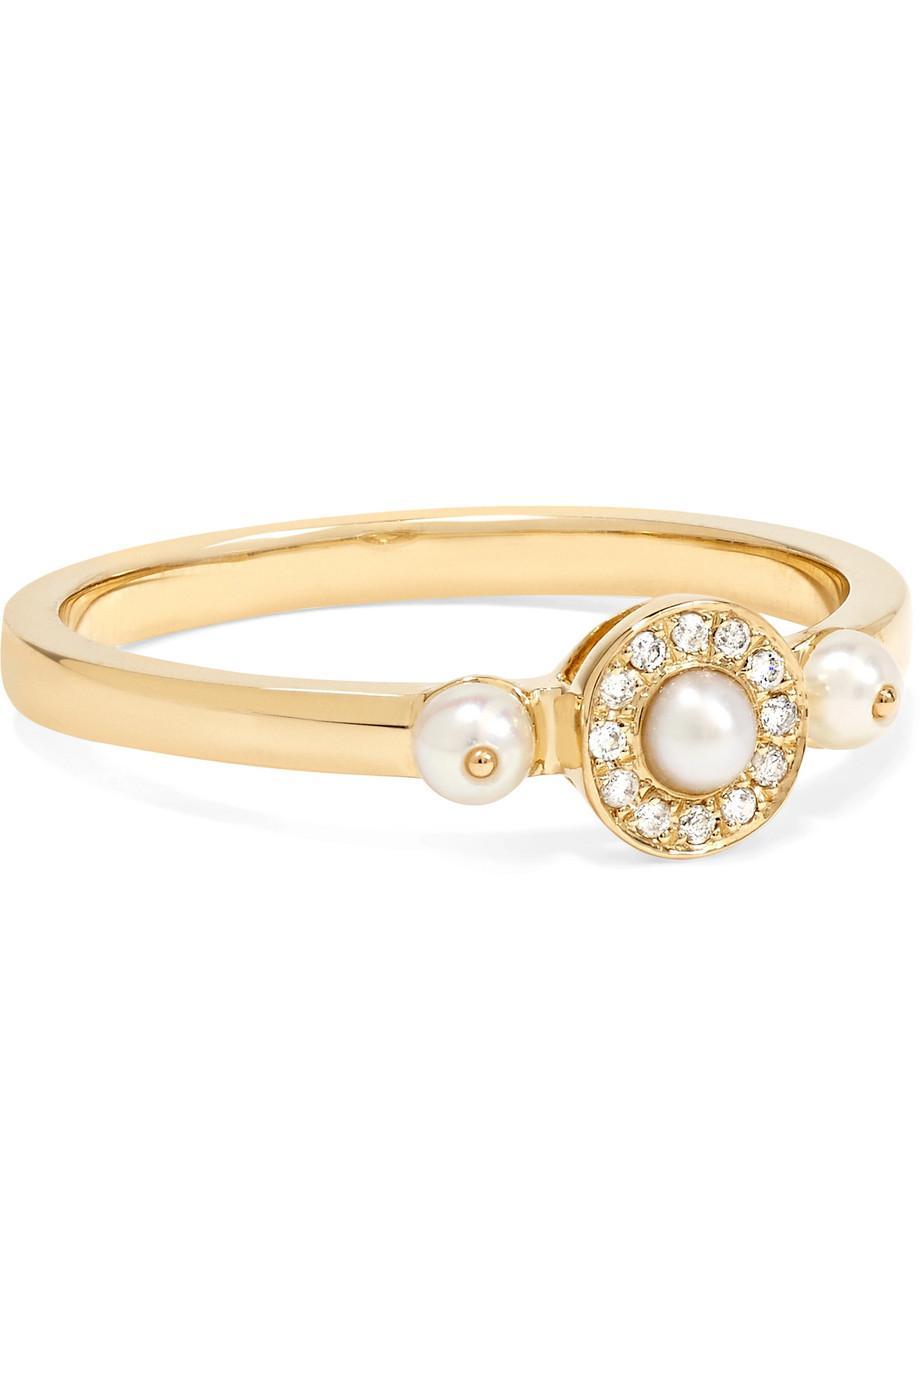 Anissa Kermiche Perle Rare 14-karat Gold, Pearl And Diamond Ring